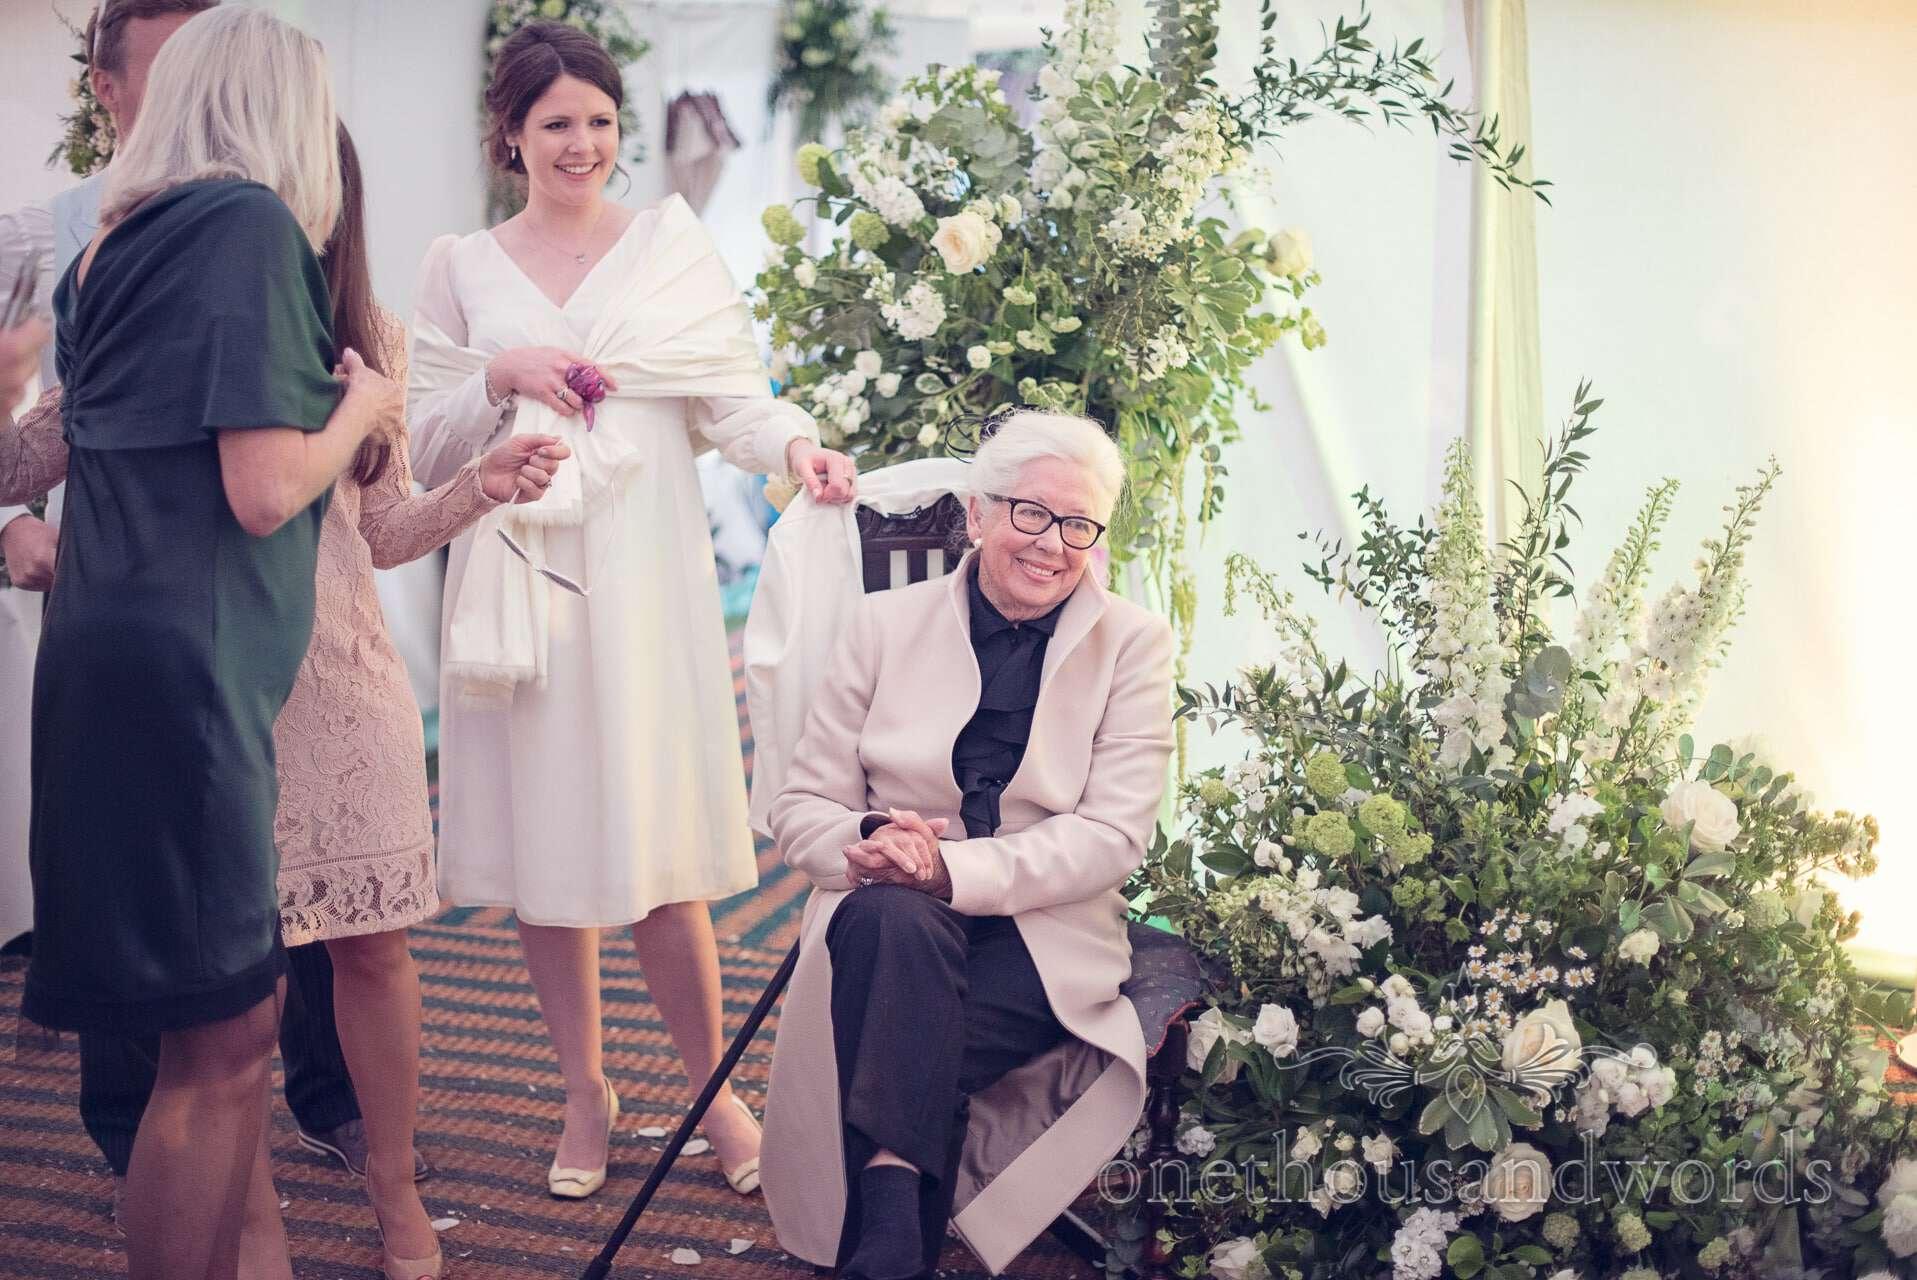 Brides grandparent watches first dance at The Priory Wareham wedding